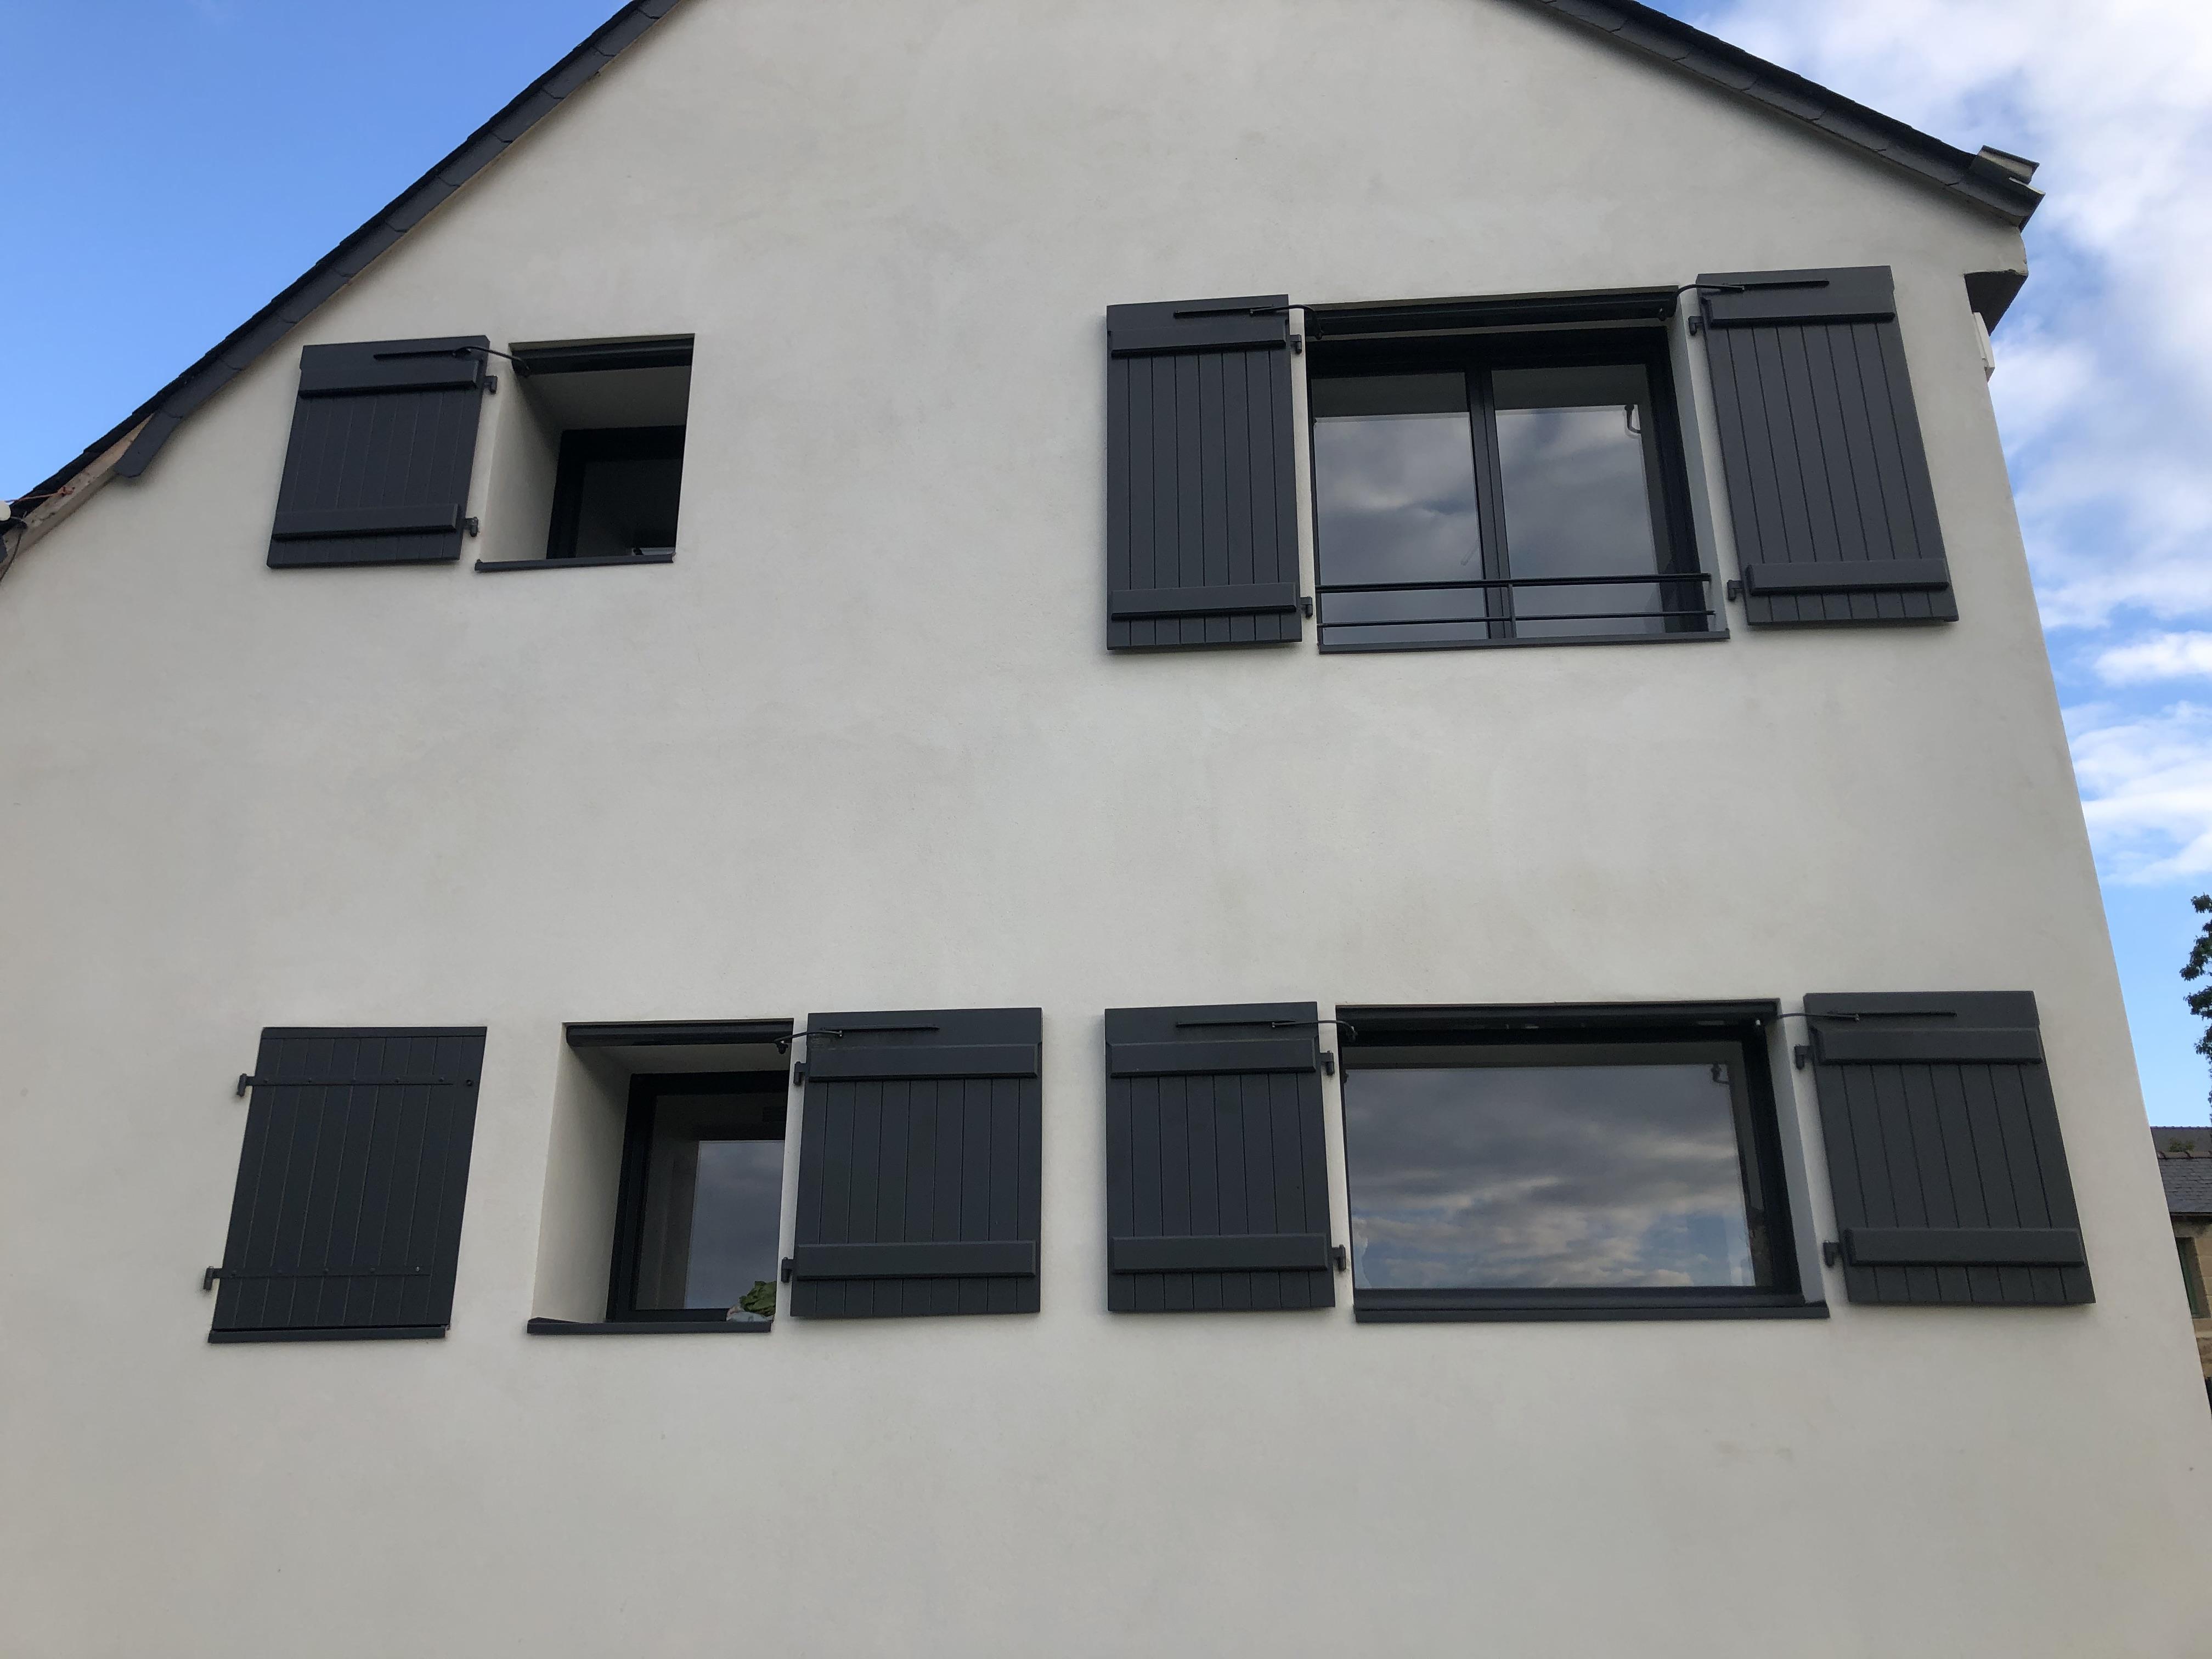 Nos fenêtres